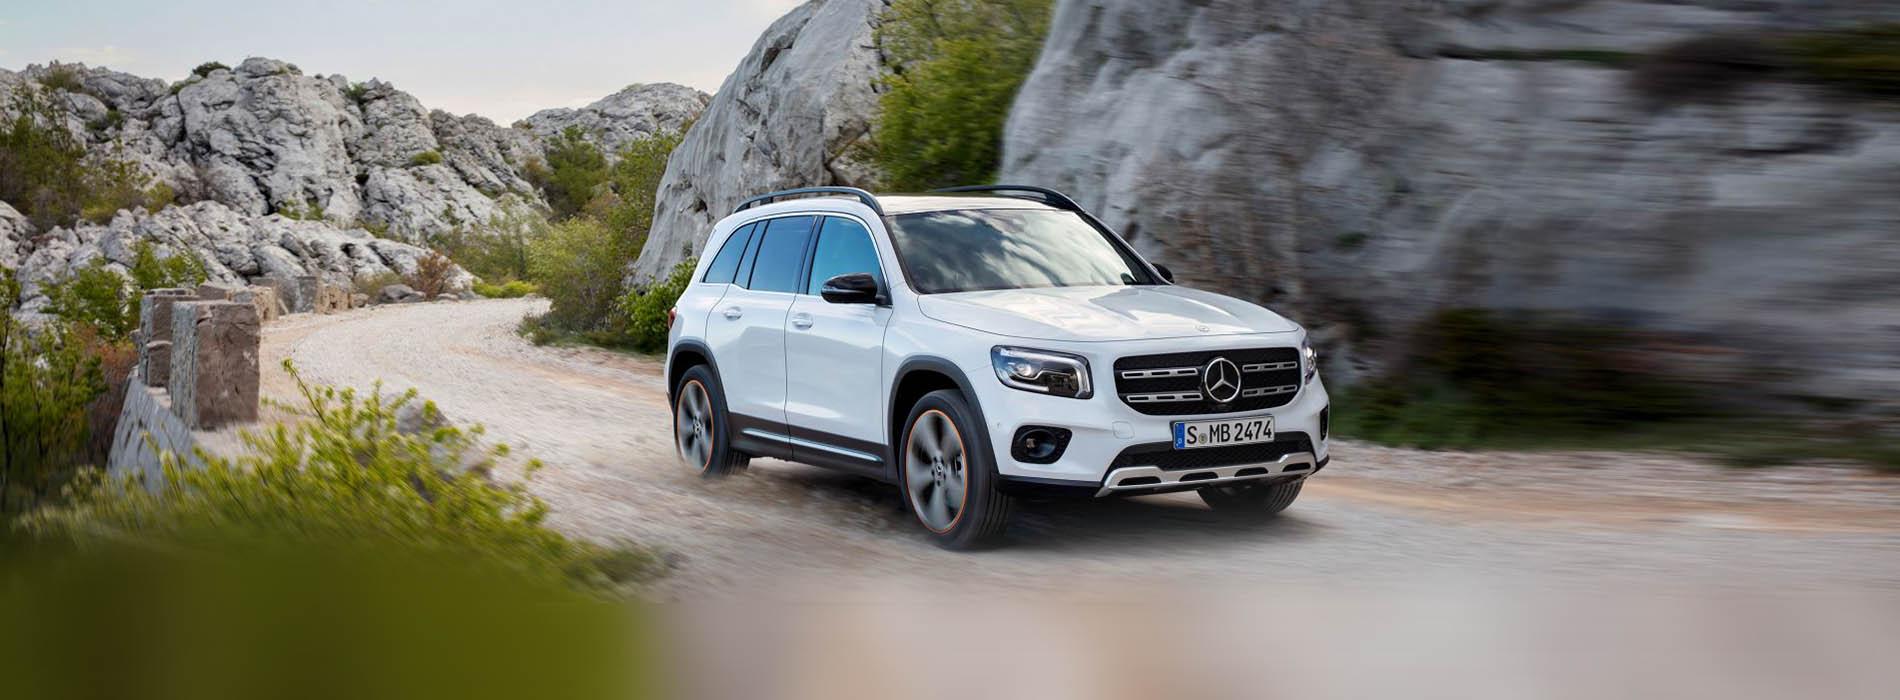 Offerta speciale per la nuova Mercedes Glb 200 D